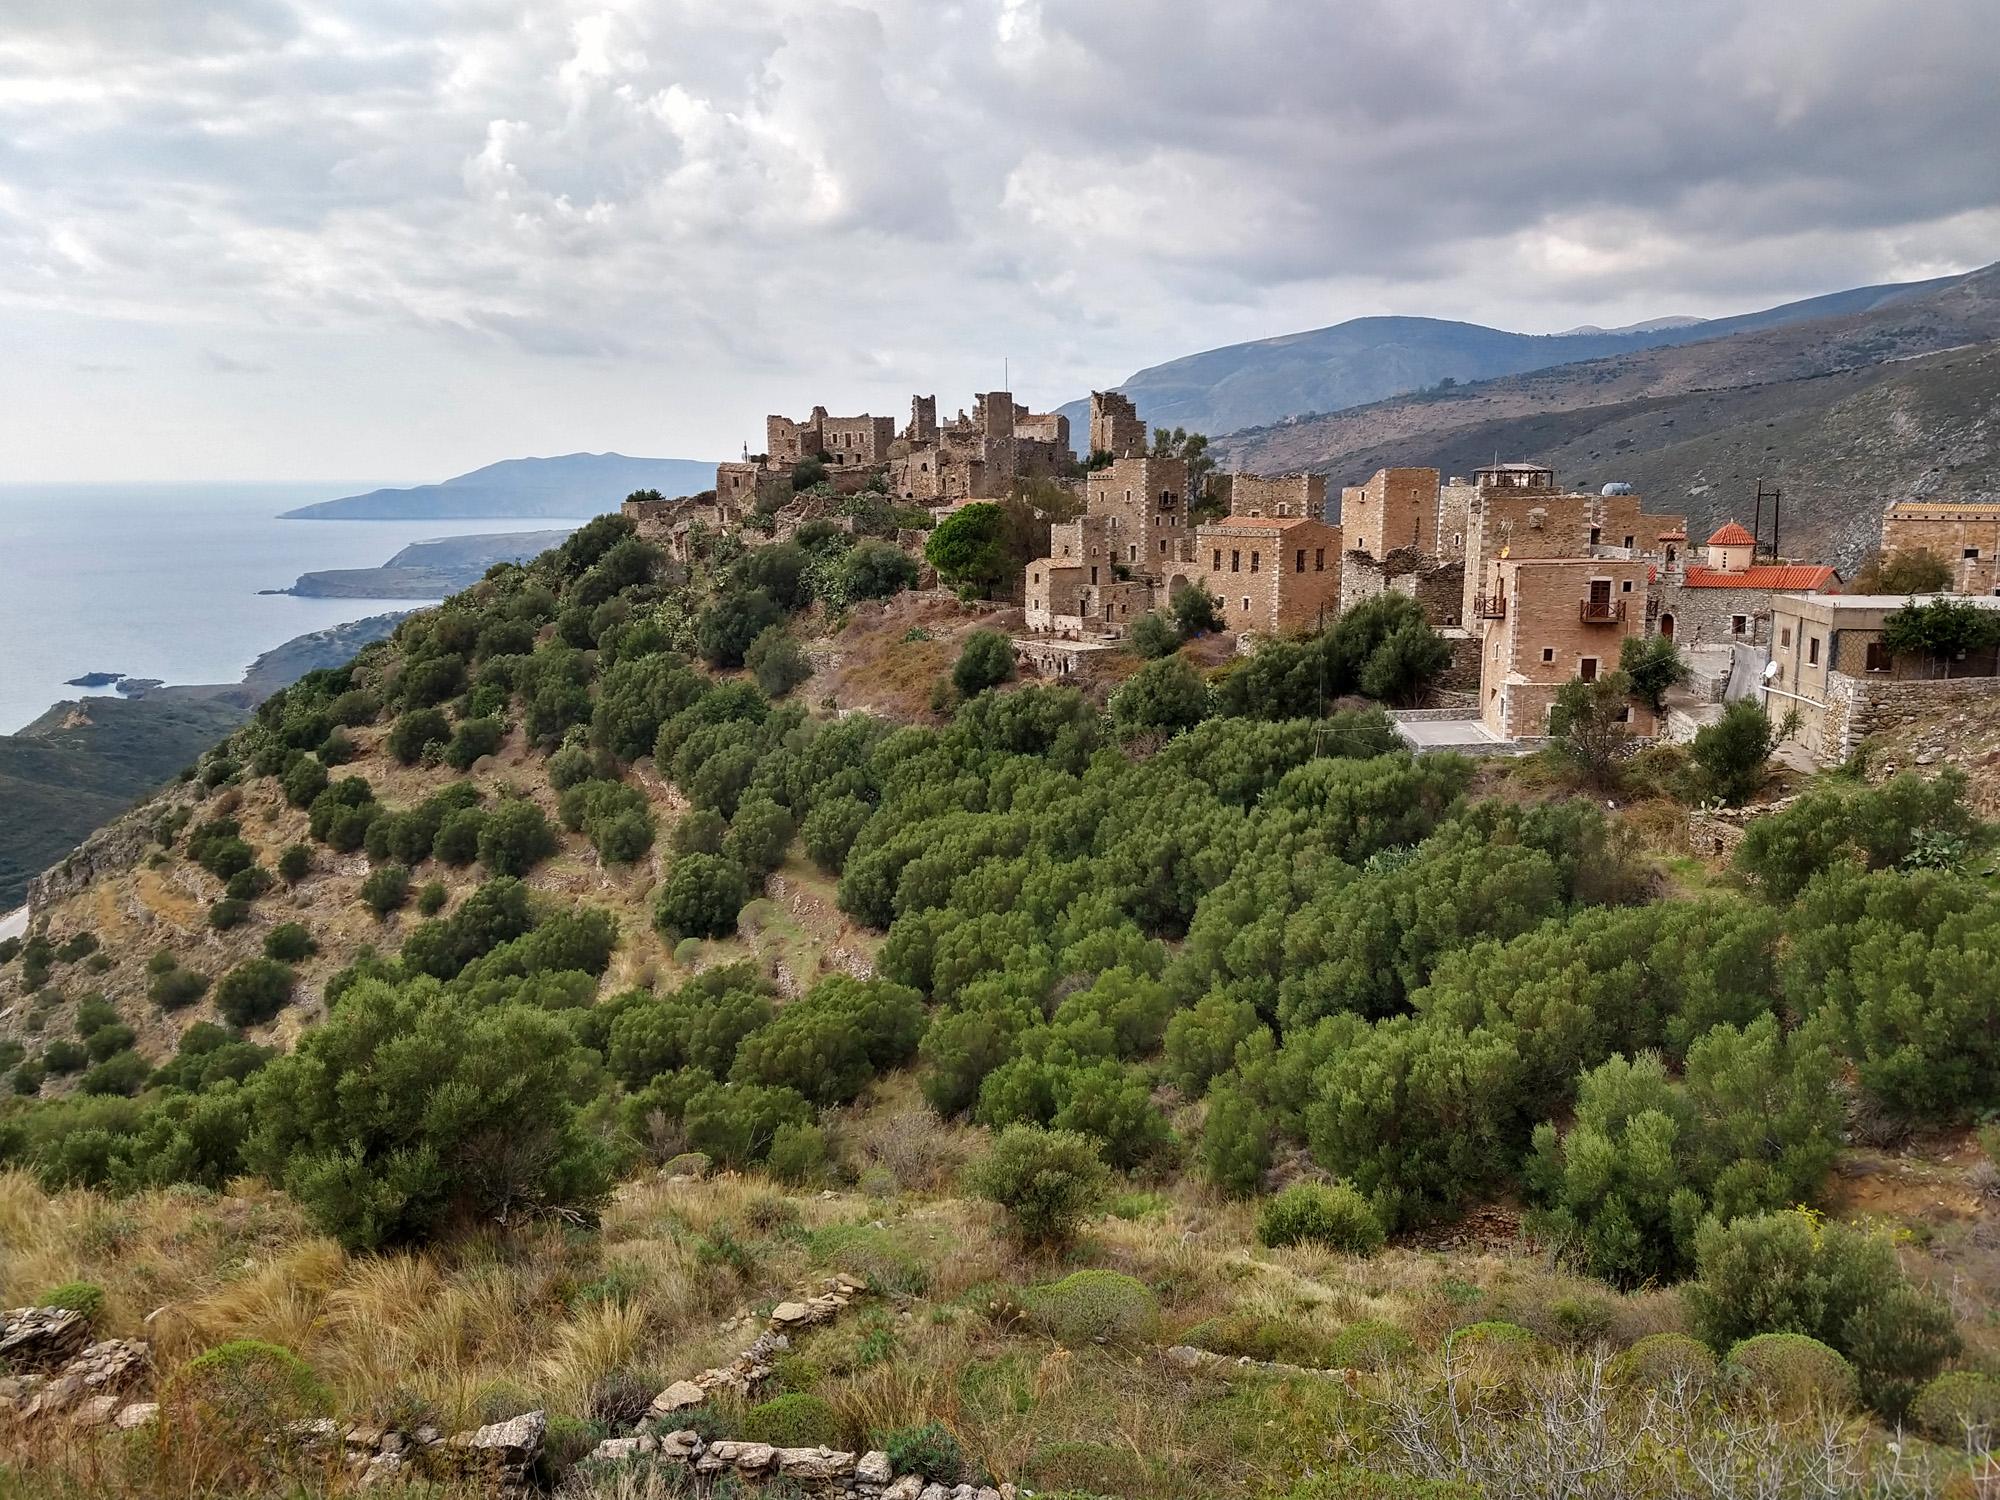 Das Klima auf dem Peloponnes